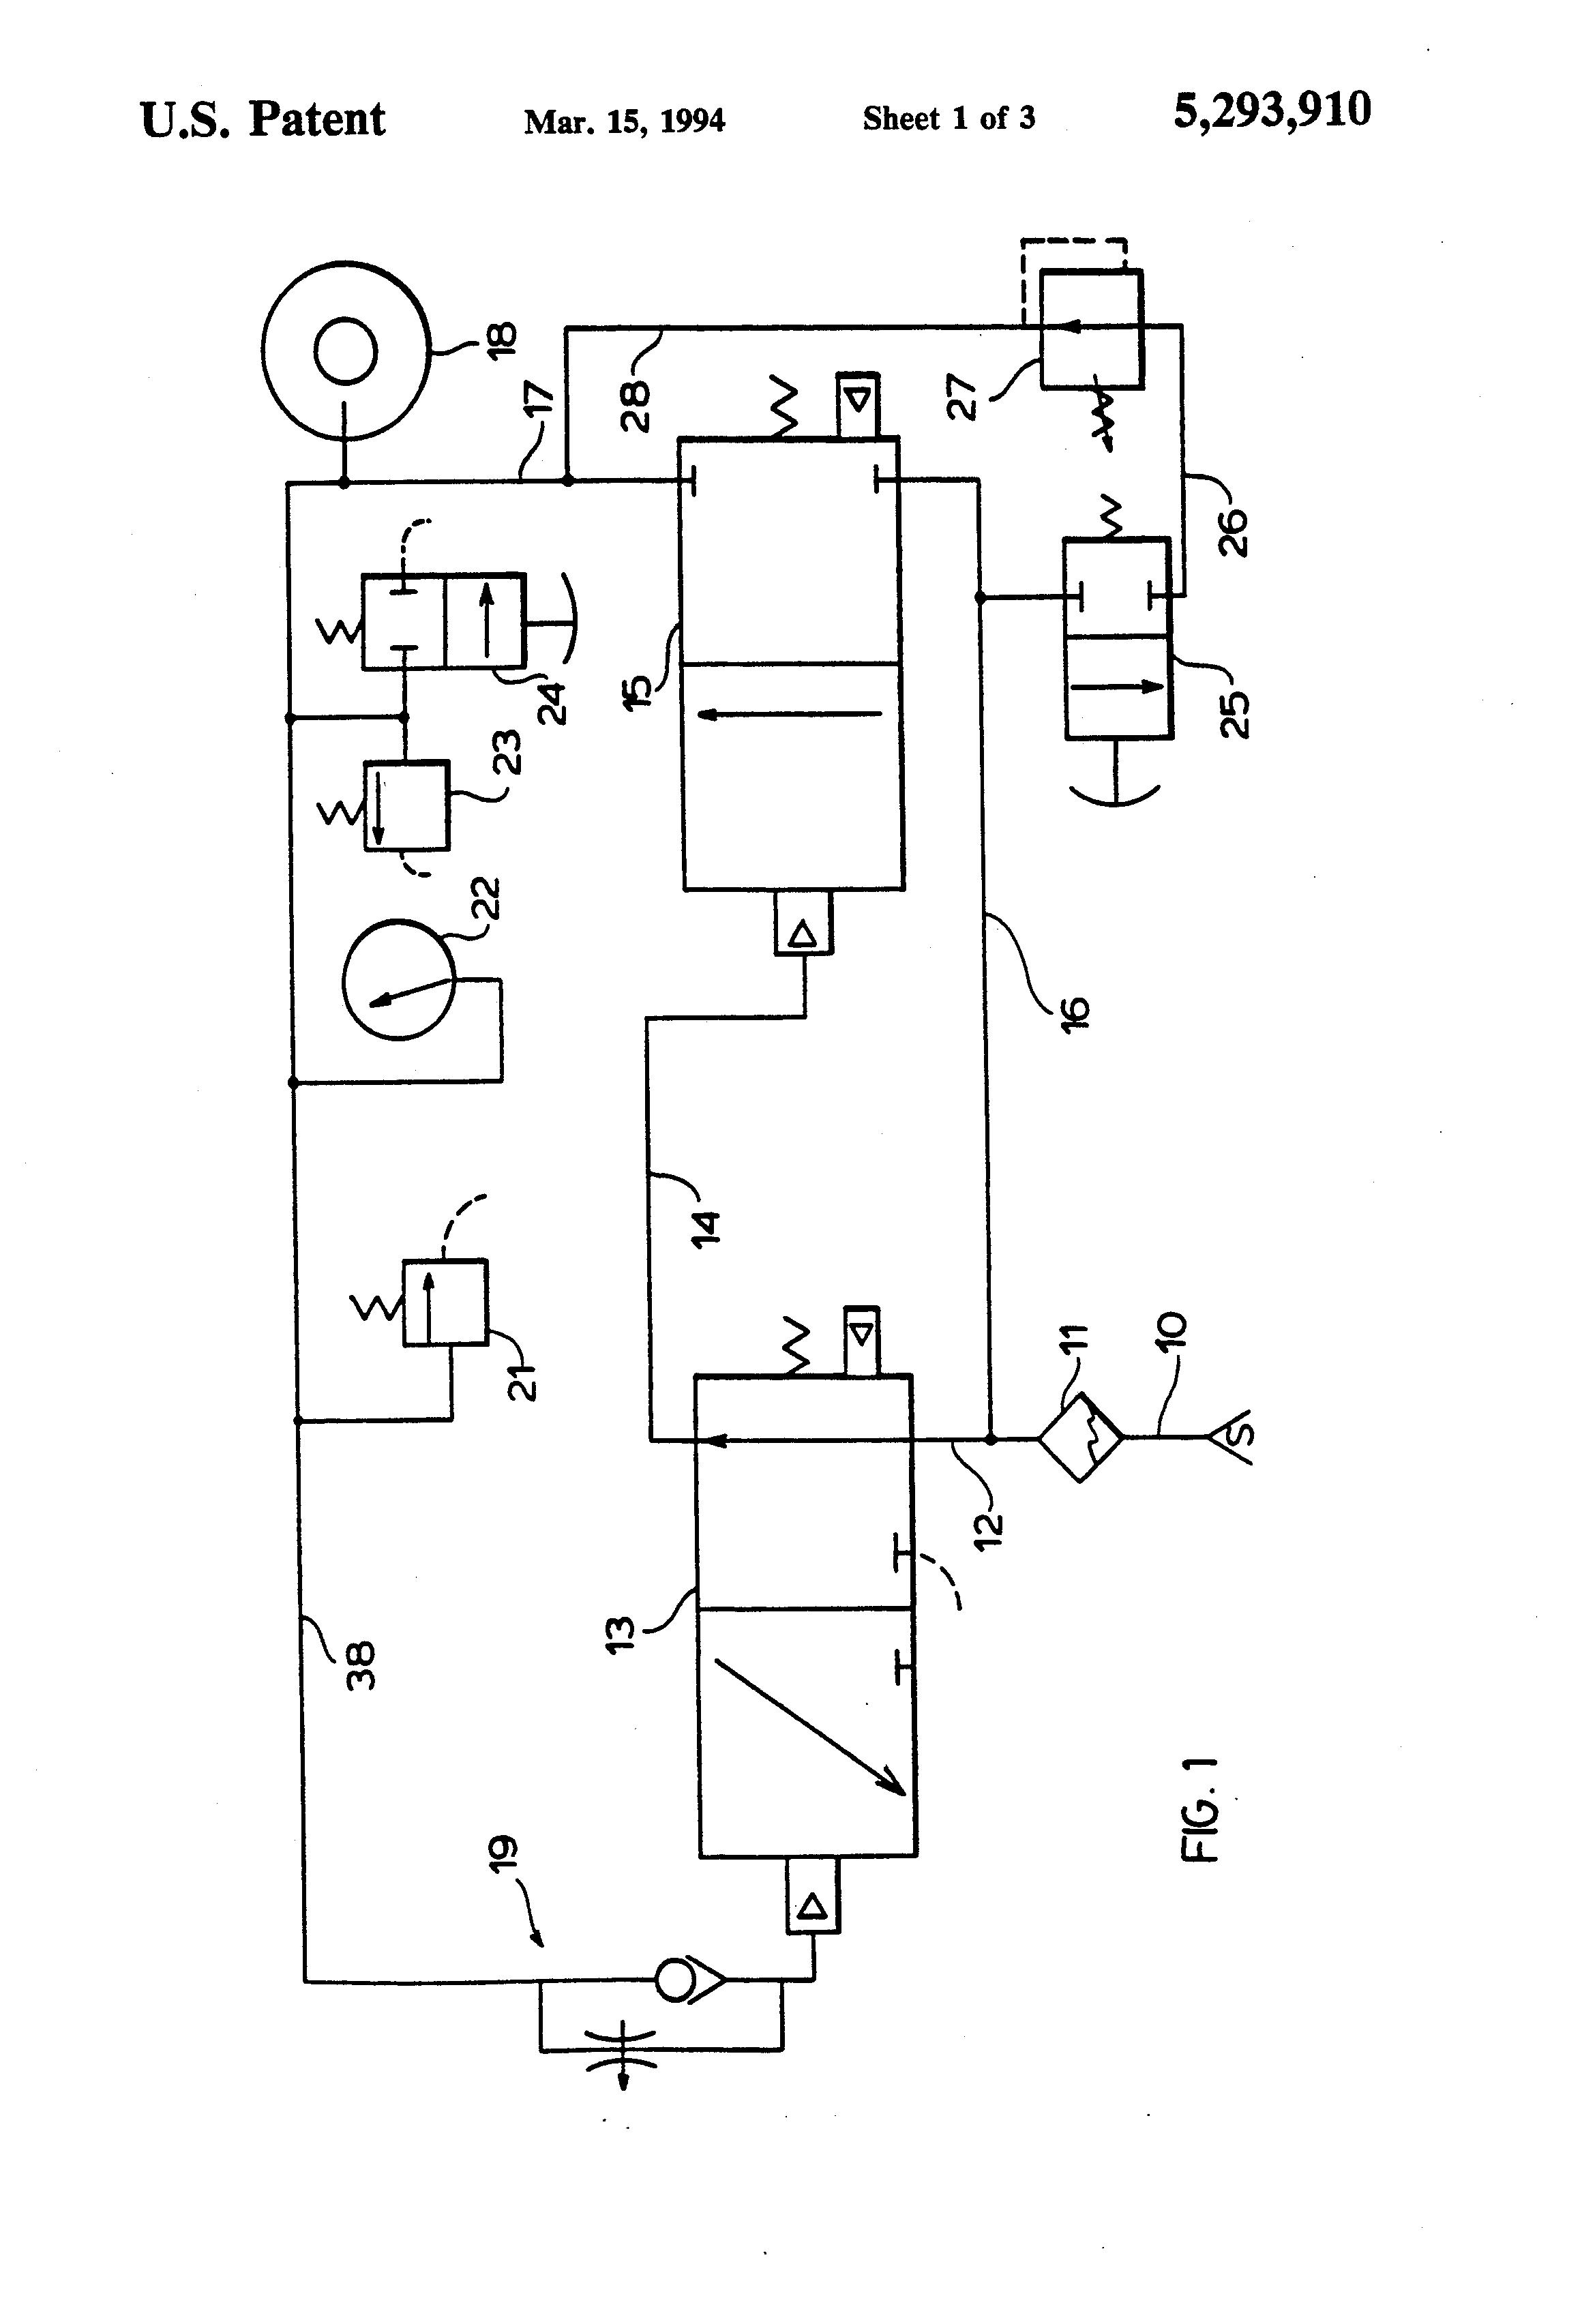 ansi standard electrical symbols  diagrams  wiring diagram images